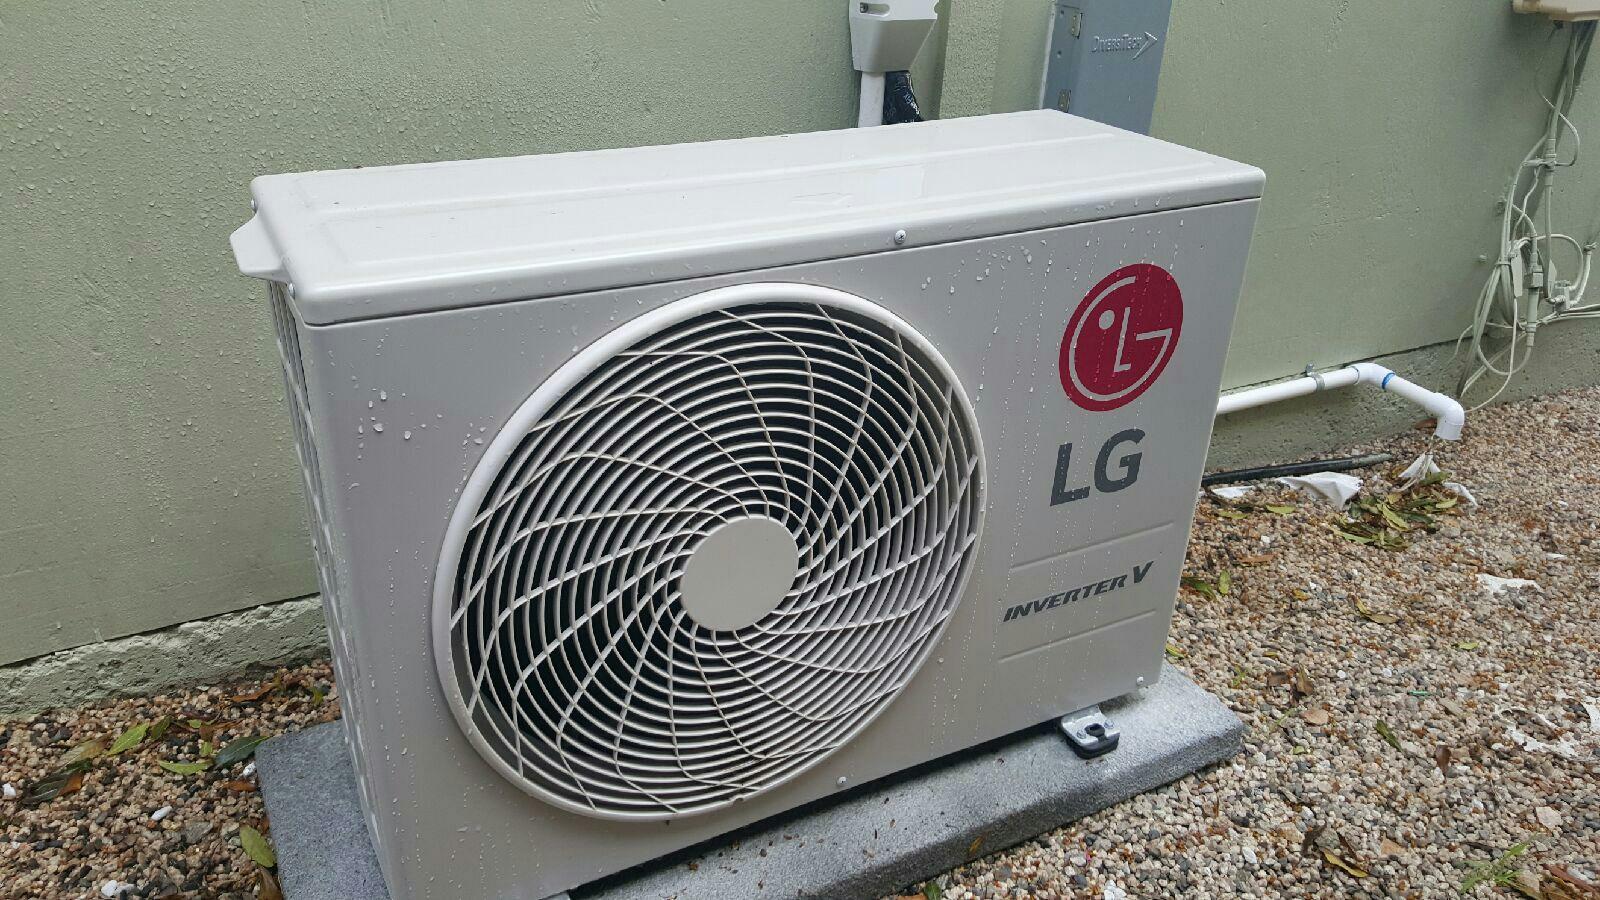 Laguna Beach, CA - Performing energy savings preventive maintenance on a LG mini split art cool ductless air conditioner.